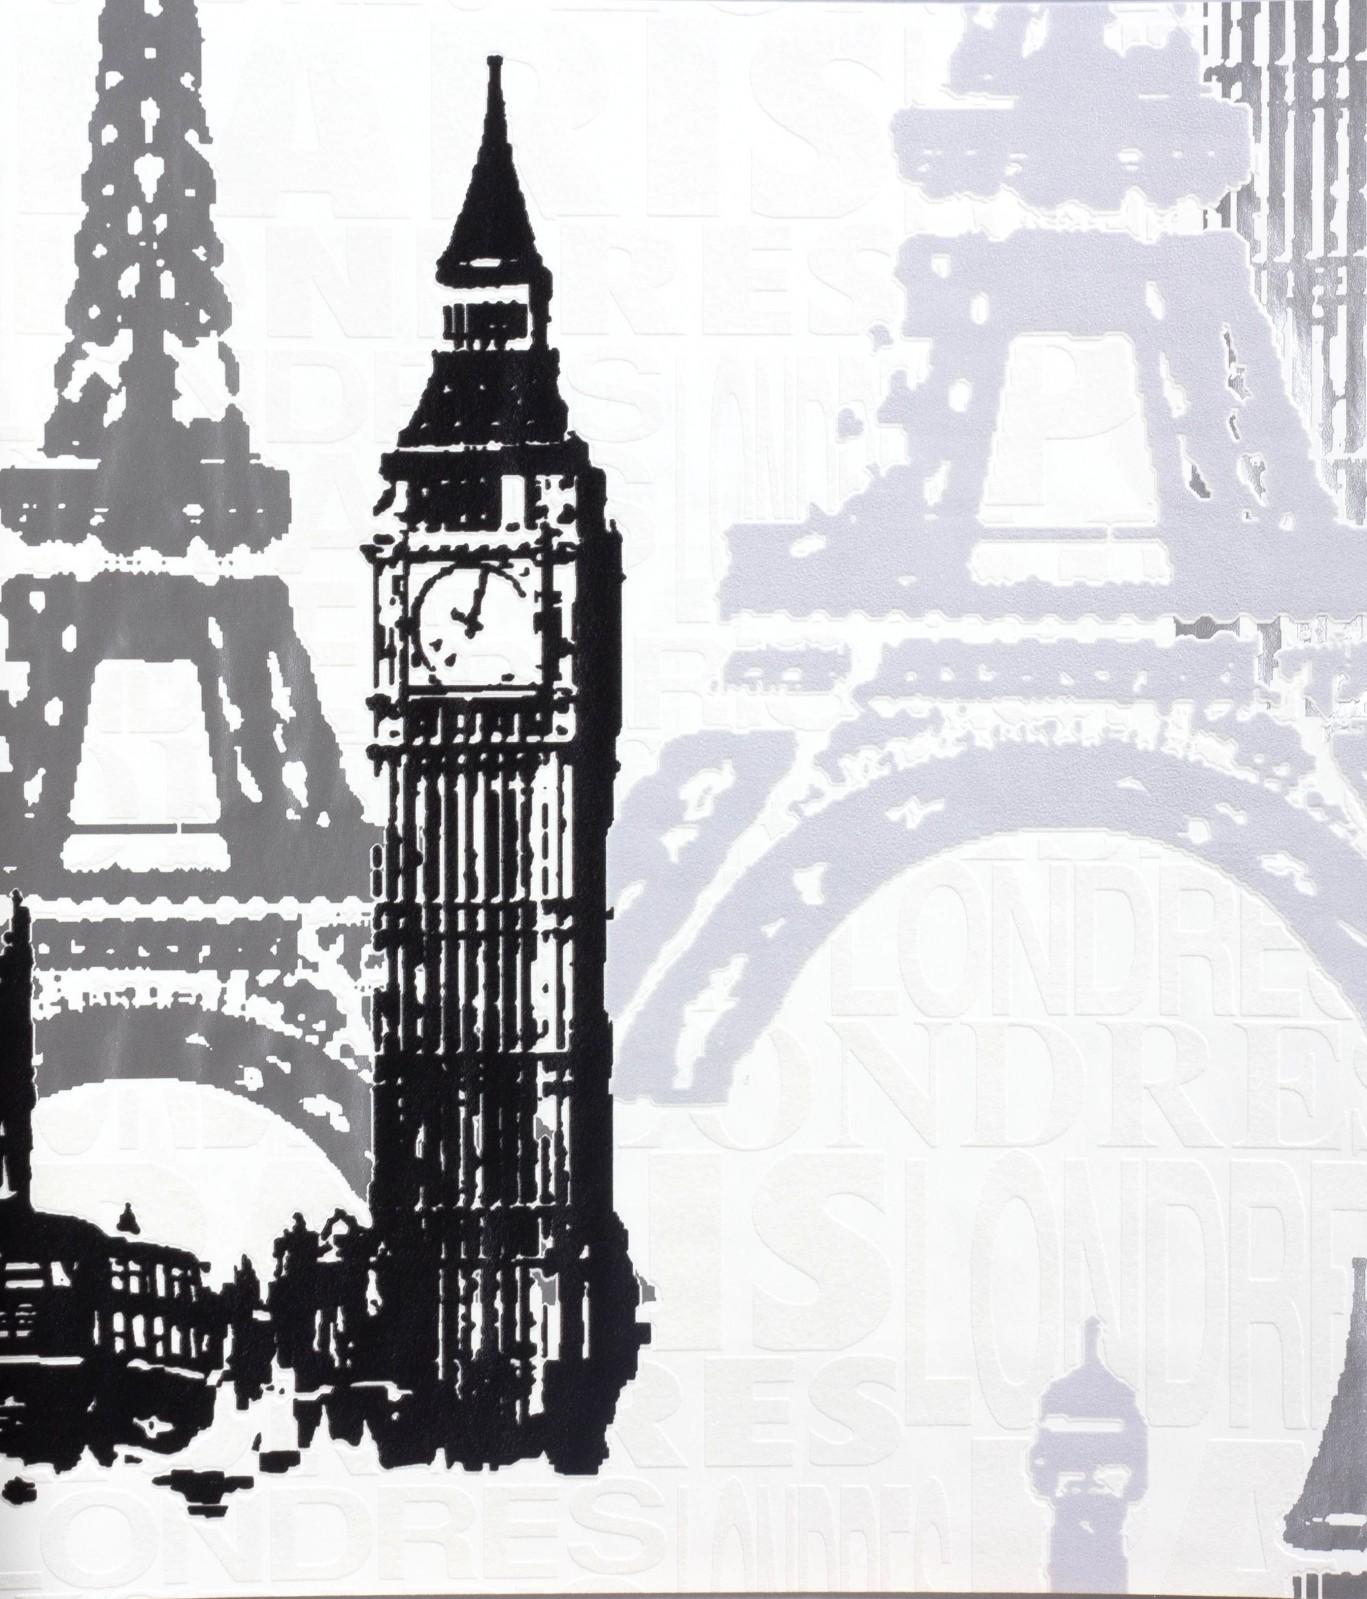 tapete rasch kids 39 club 734805 stadt paris london weiss. Black Bedroom Furniture Sets. Home Design Ideas